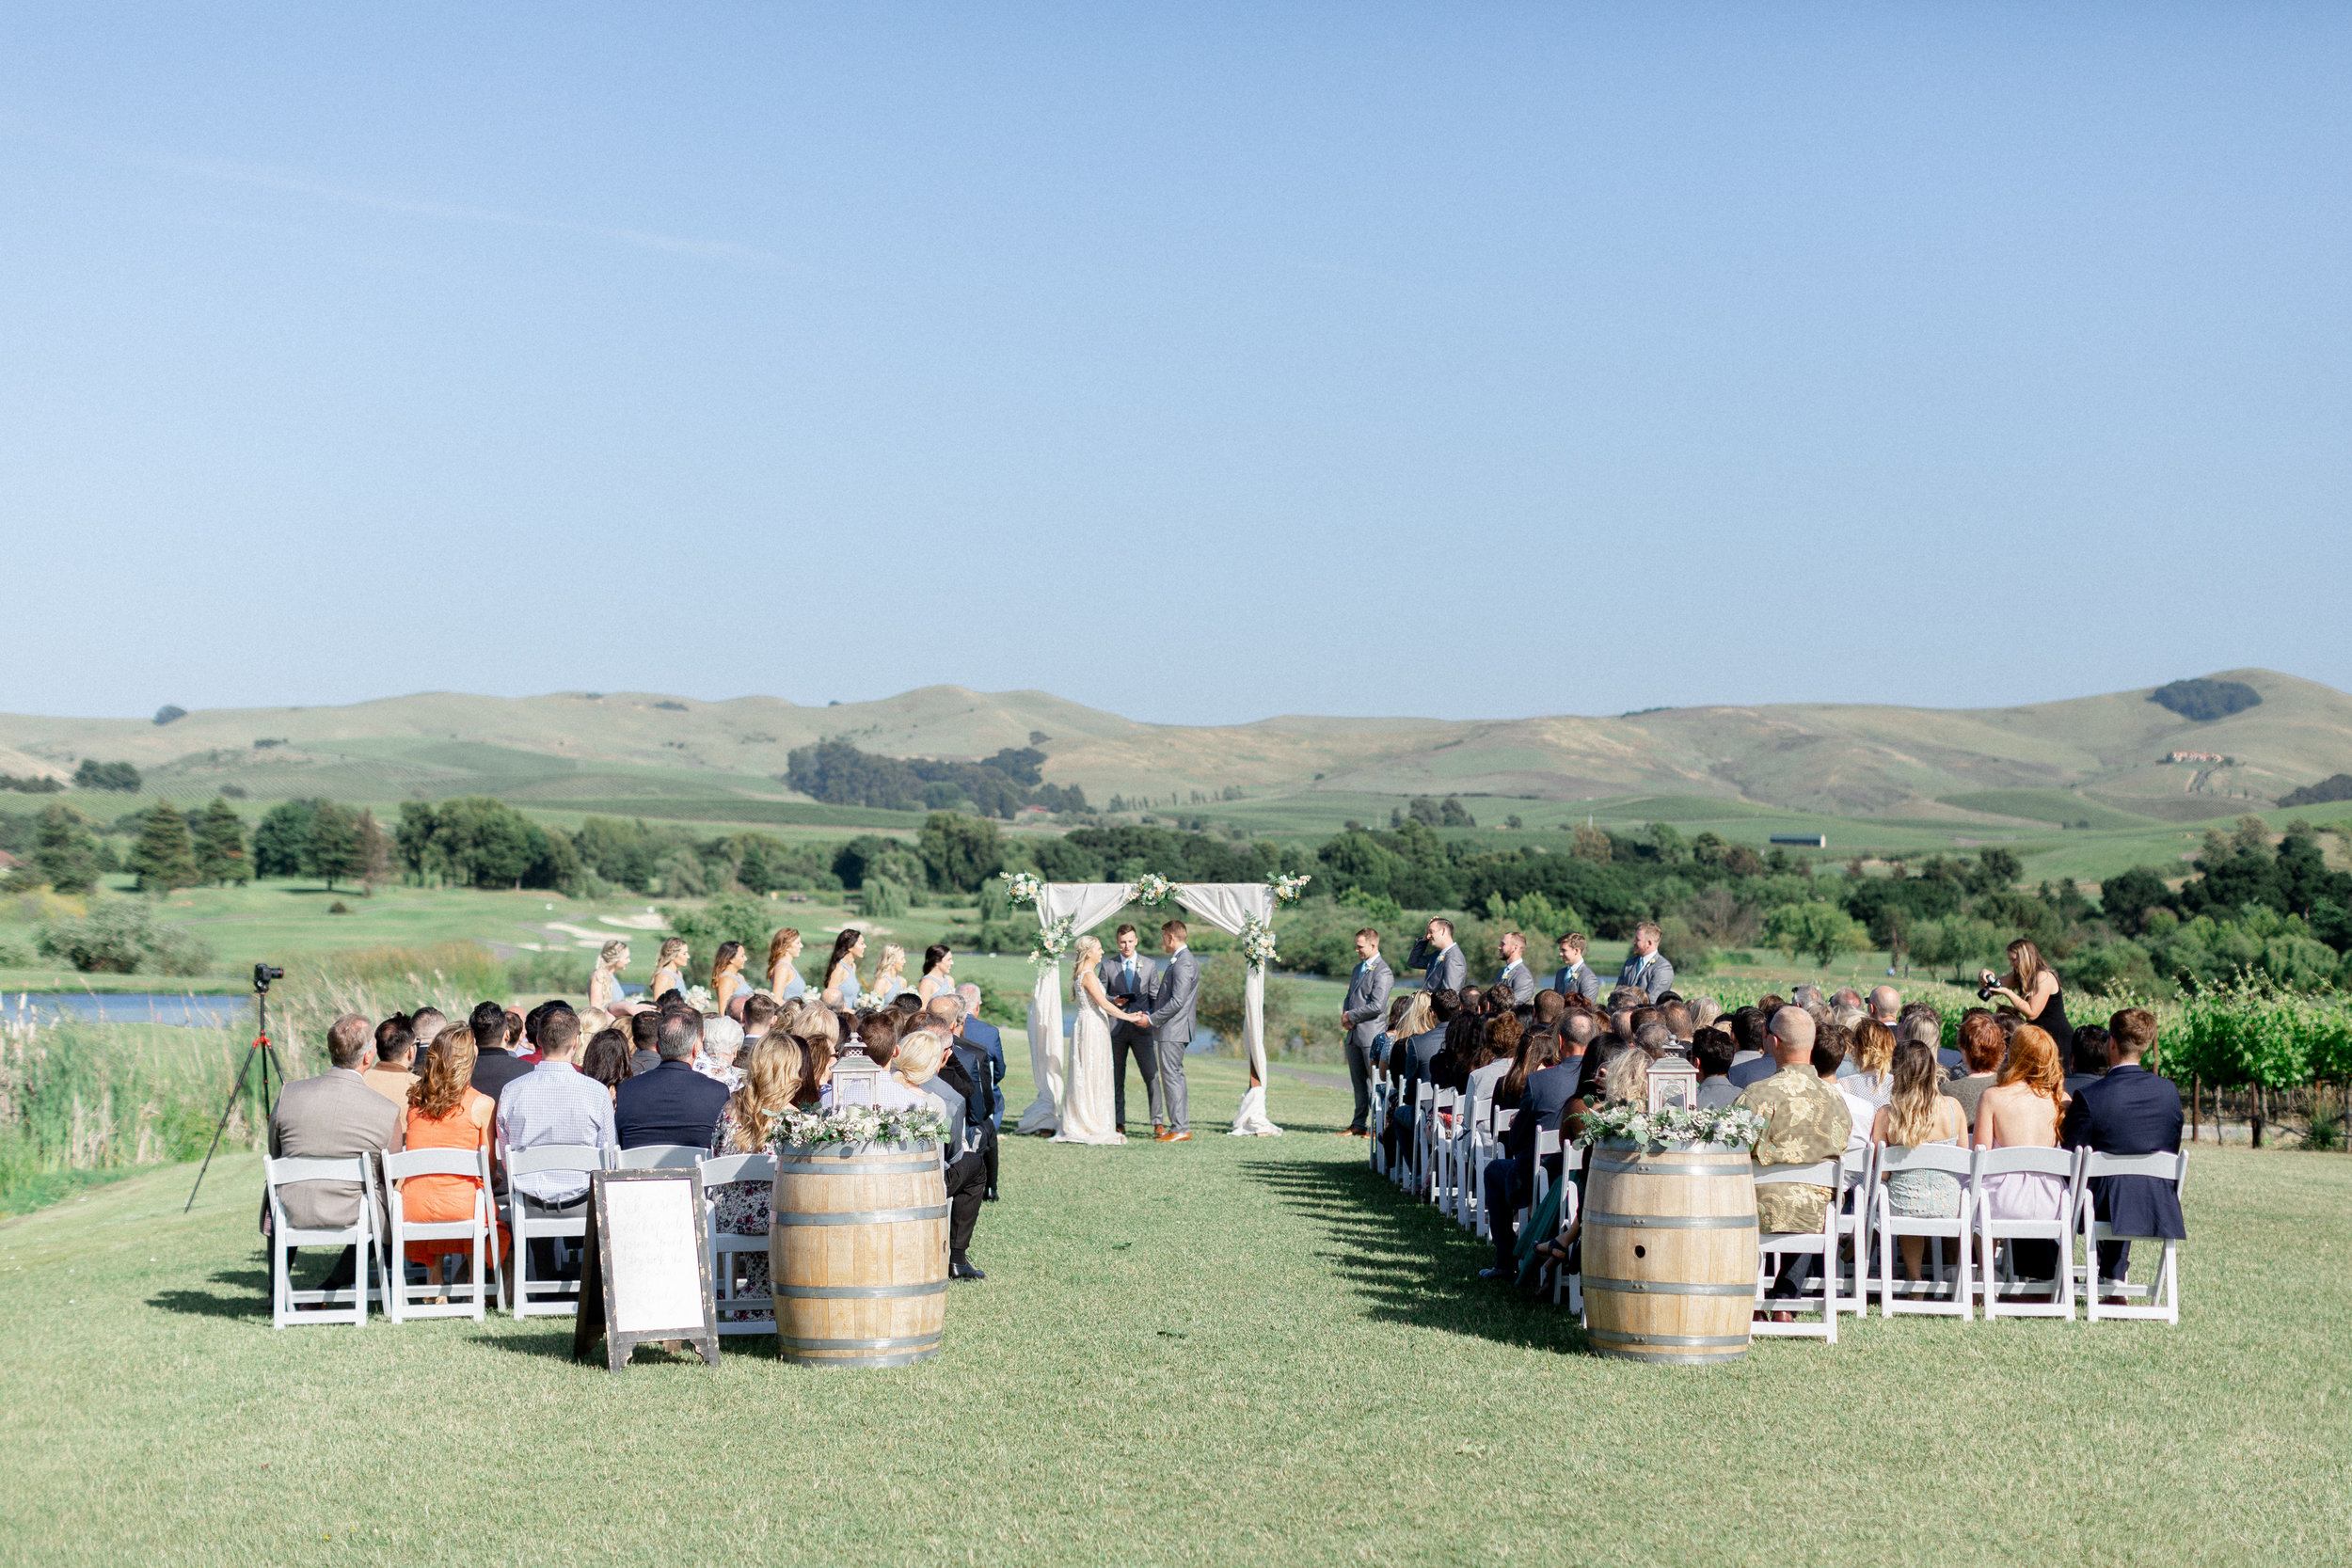 Eagle-Vines-Golf-Course-wedding-photographer (100 of 206).jpg